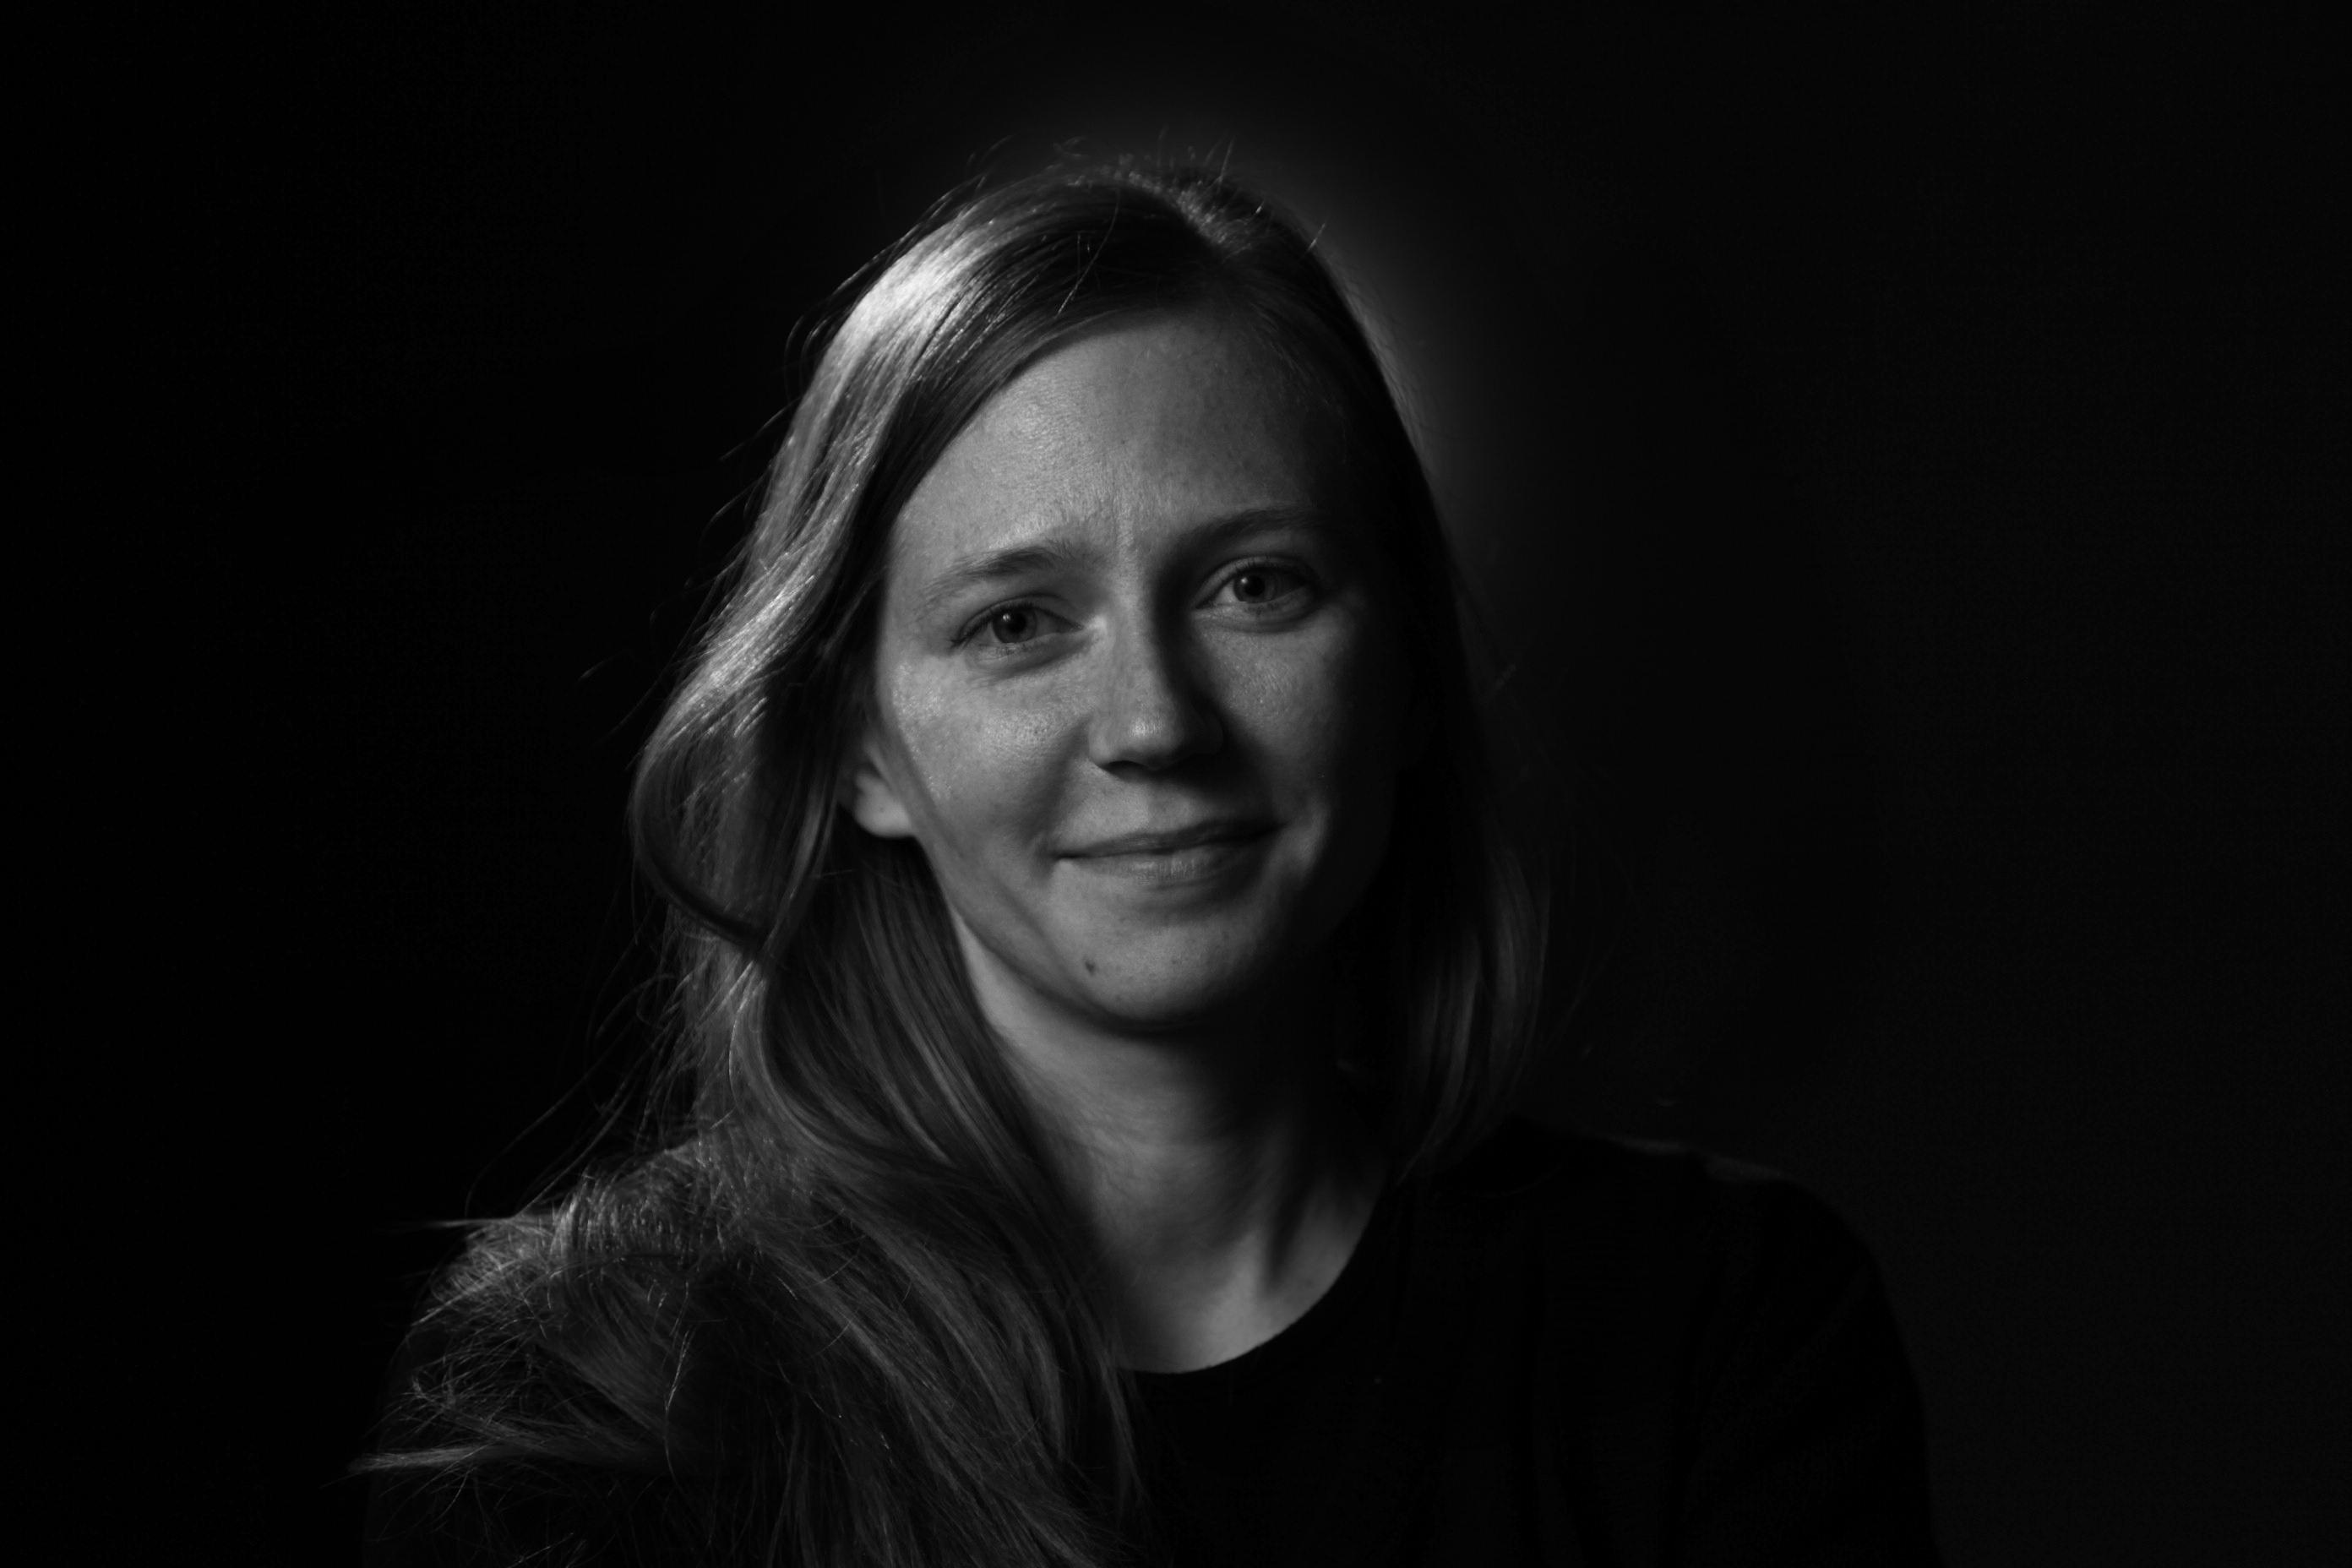 Natalia Krawczuk